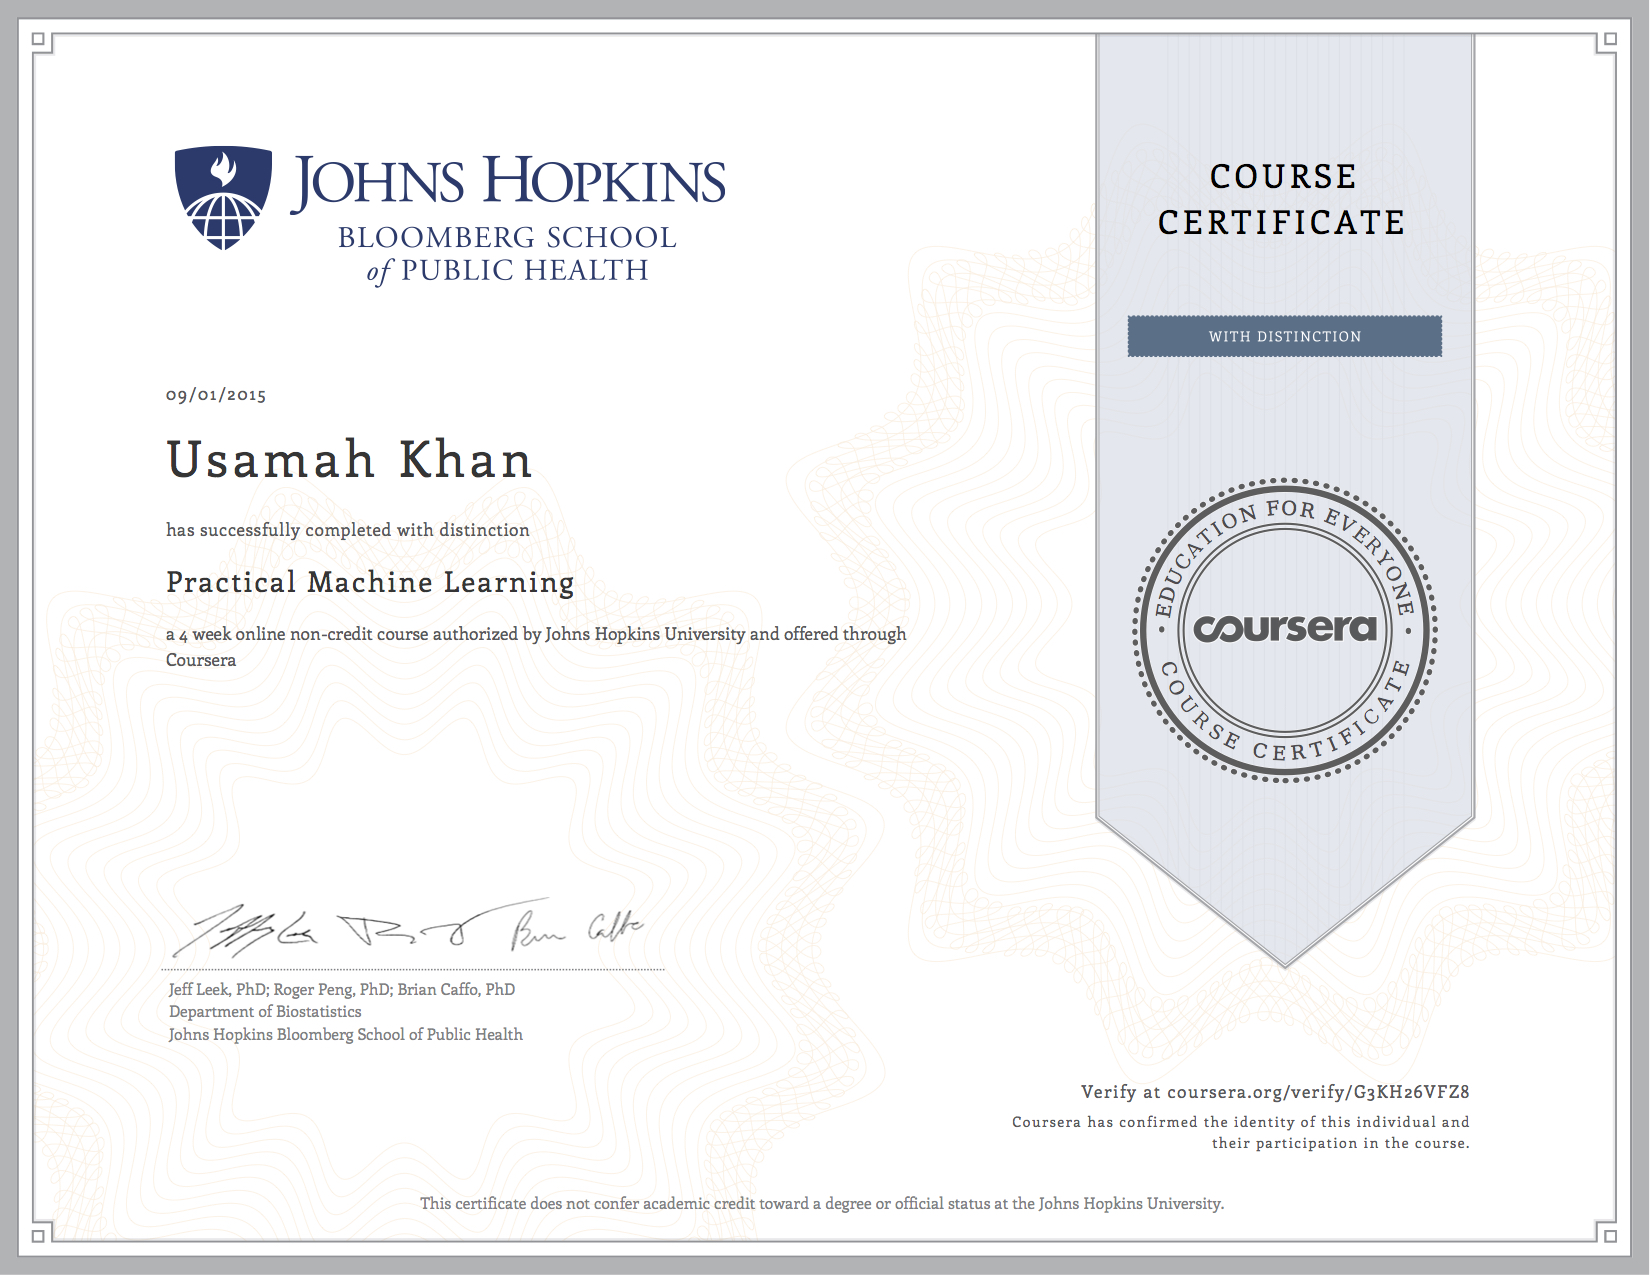 Coursera predmachlearn 2016.jpg